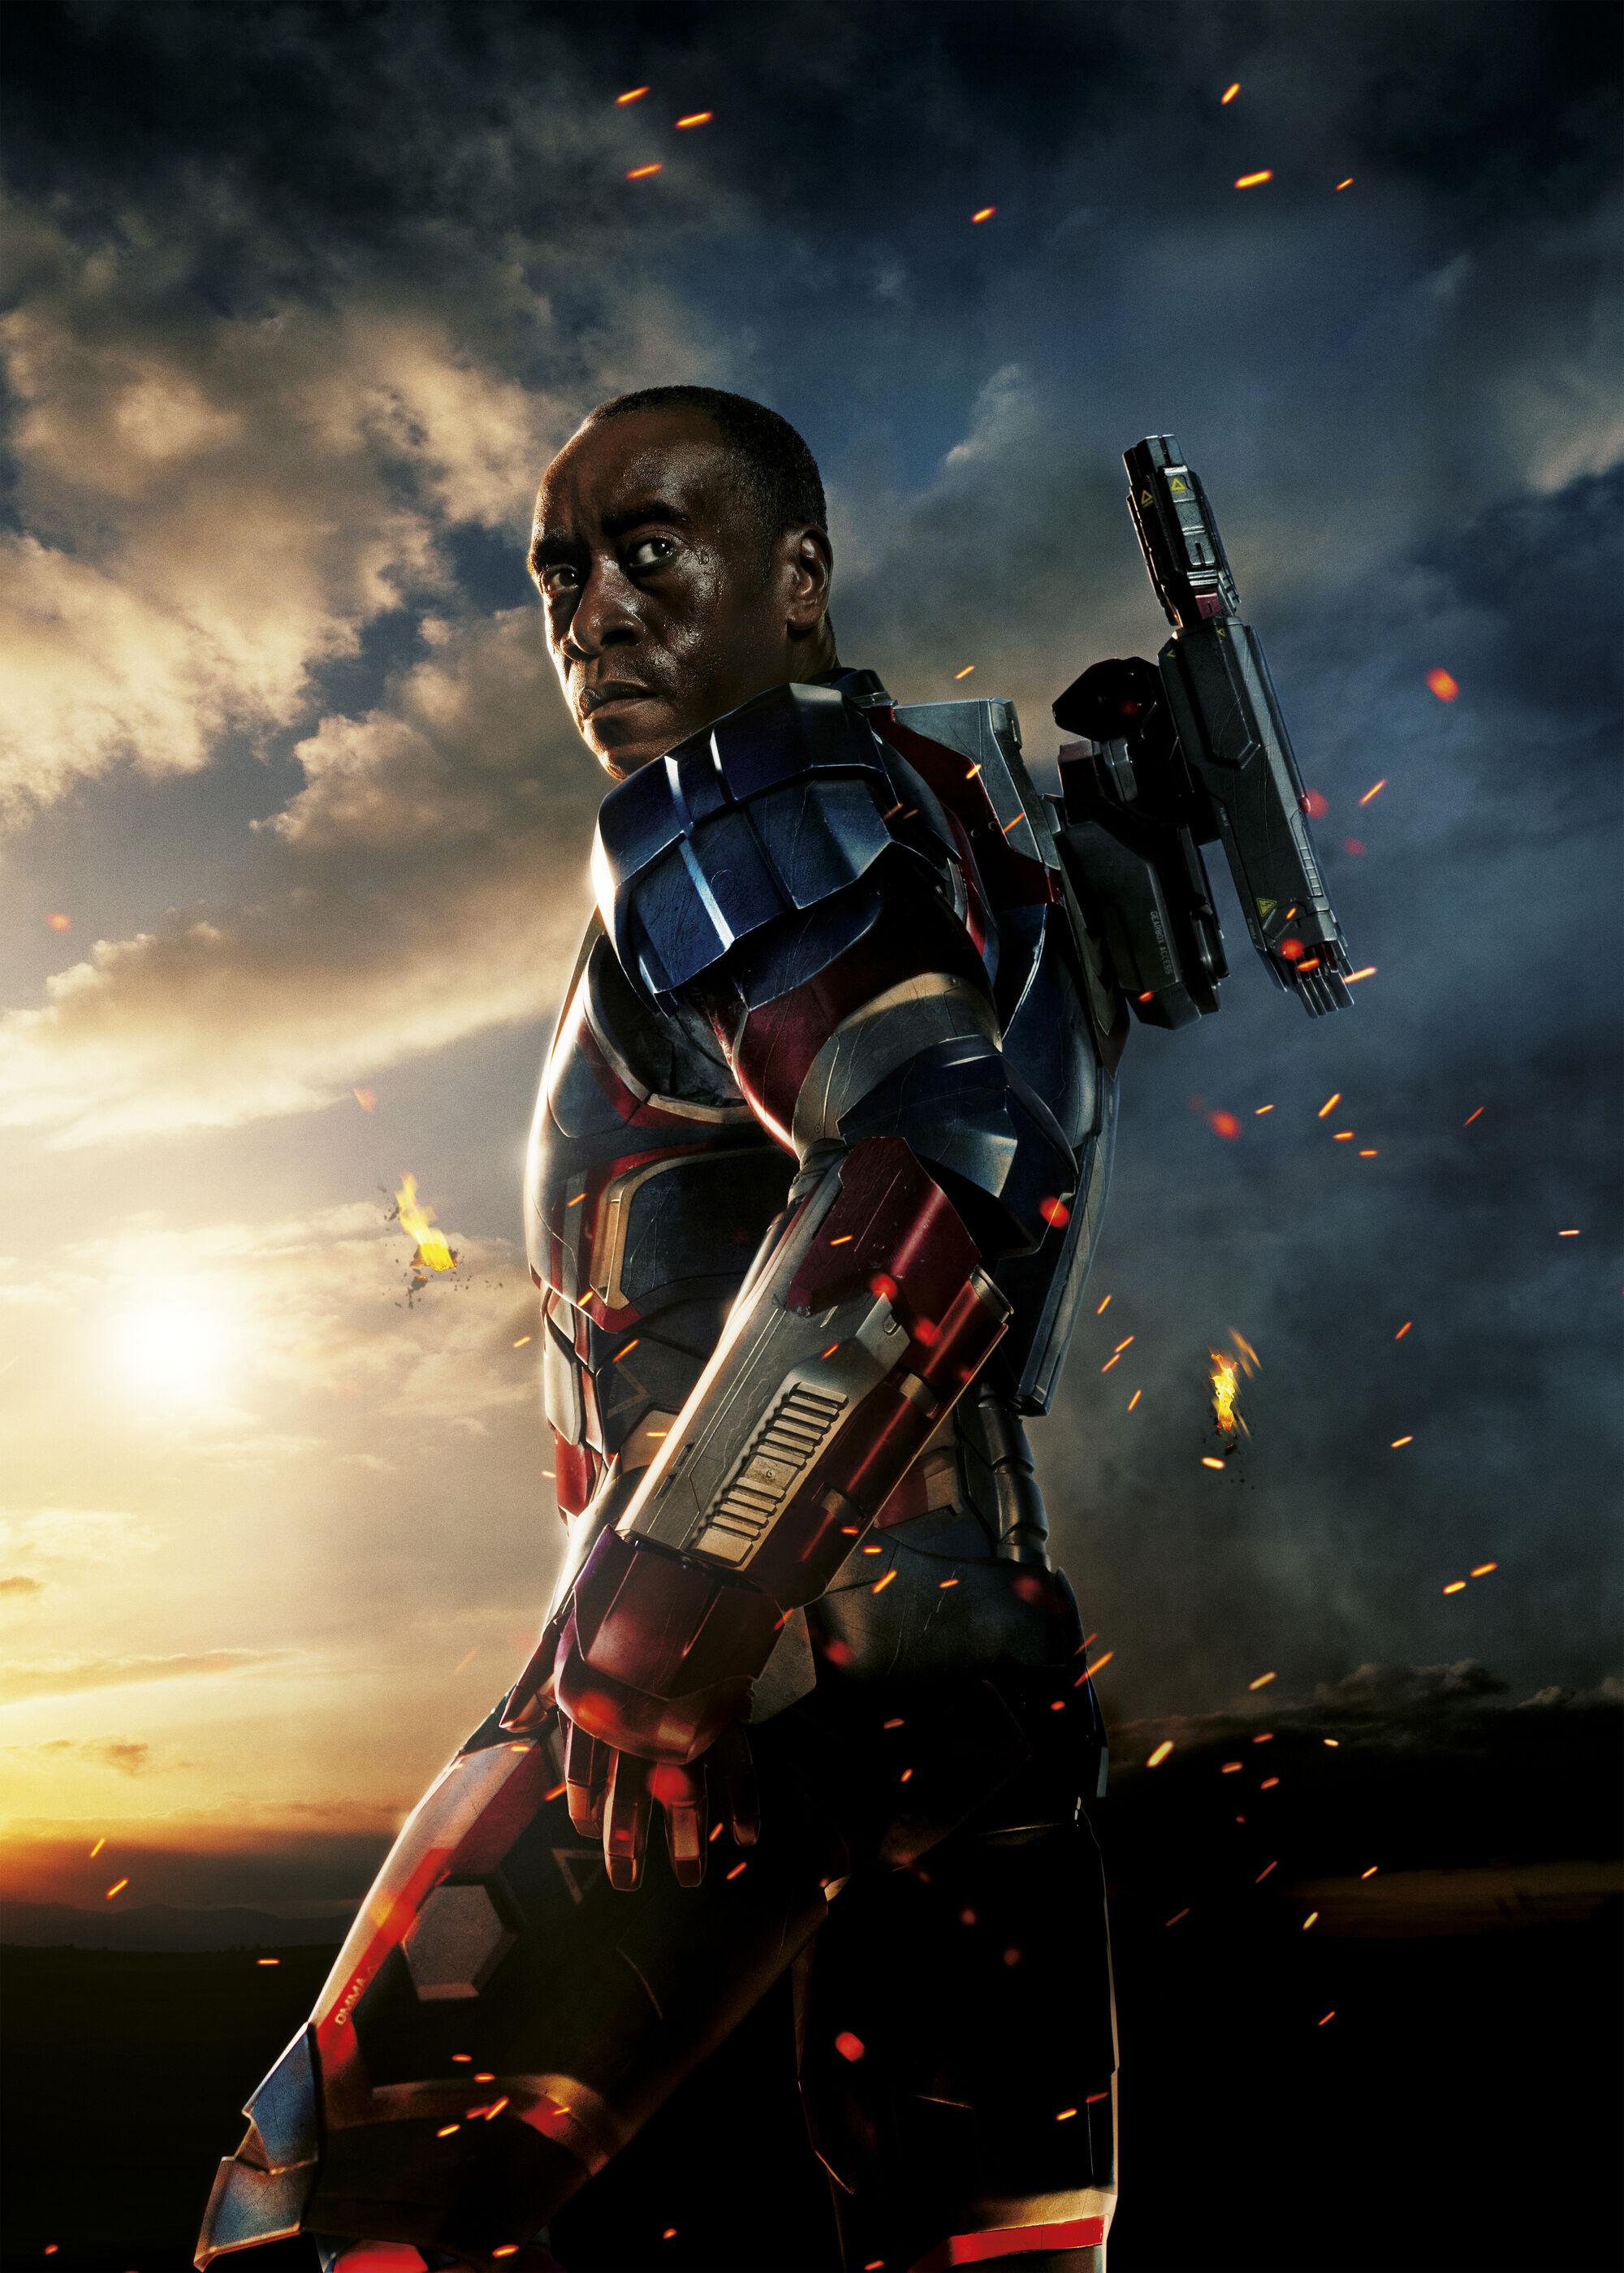 Image - Rsz iron-man-3-war-machine.jpg | Marvel Cinematic Universe ...